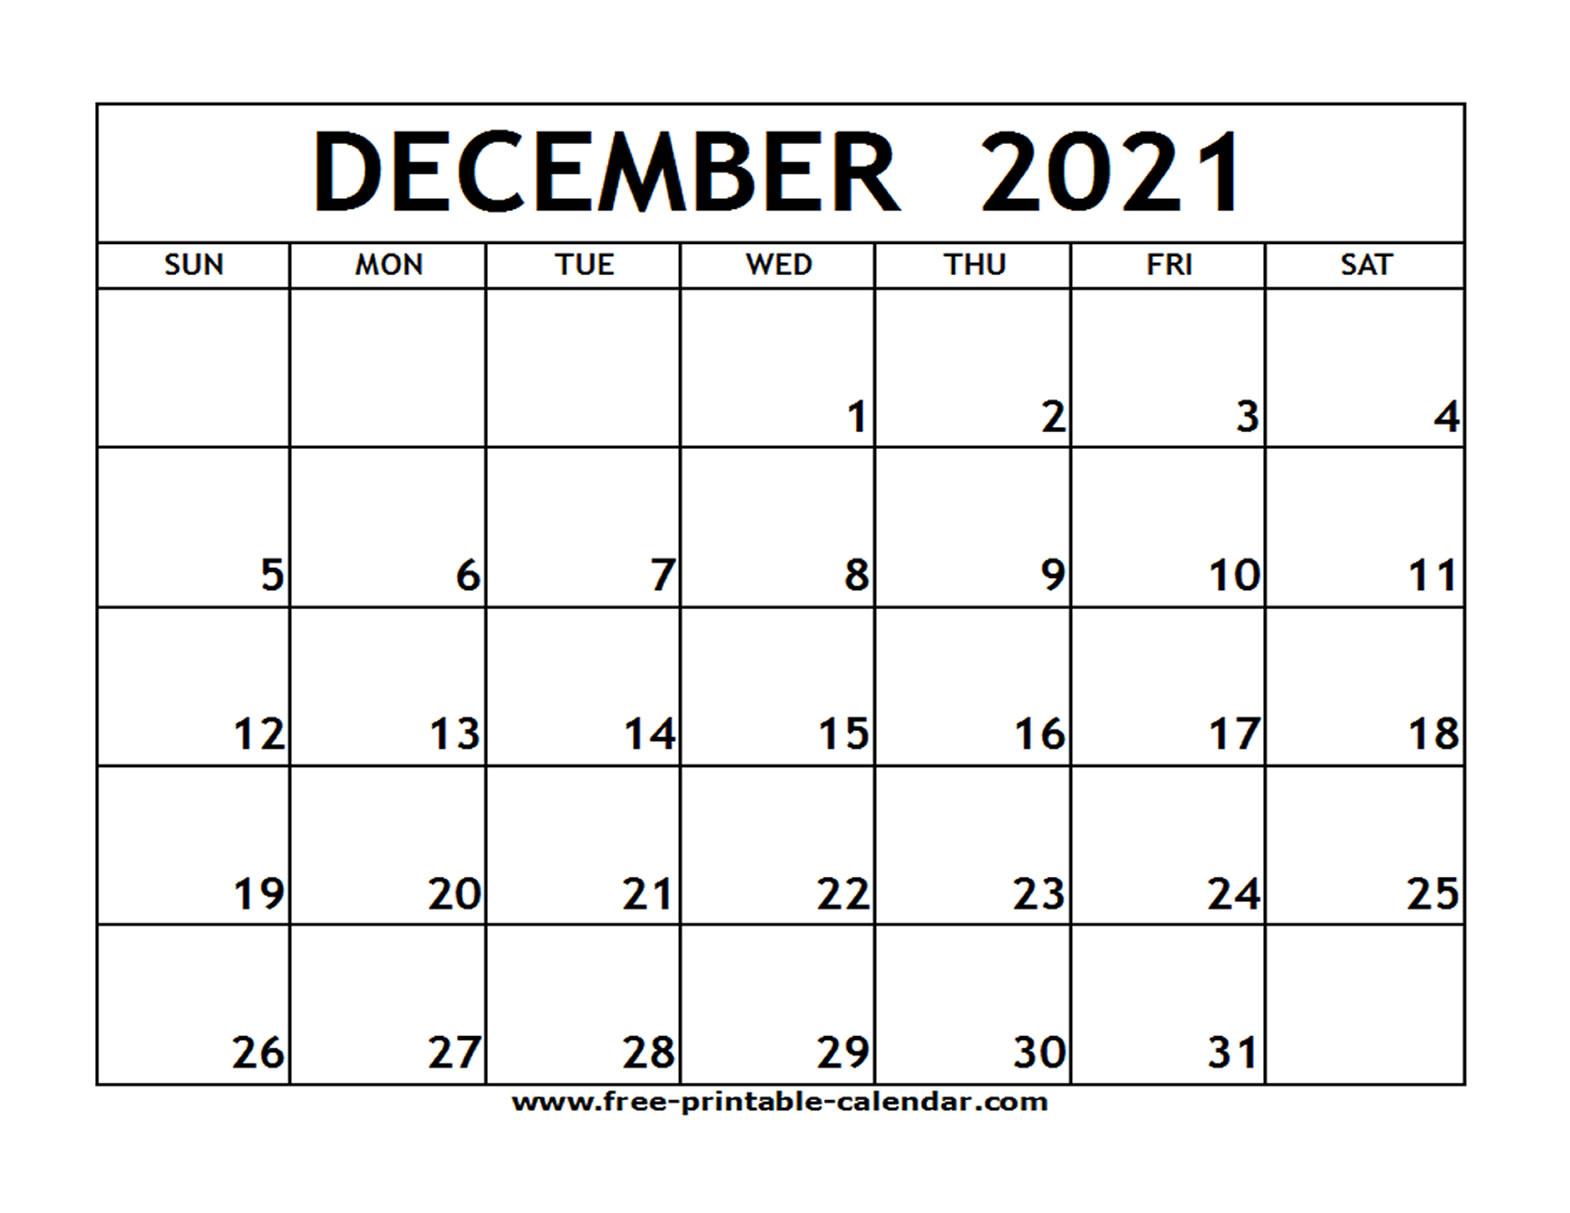 Dec 2021 Printable Calendar   Free Printable Calendar within 3 Month Blank Printable Calendar 2021